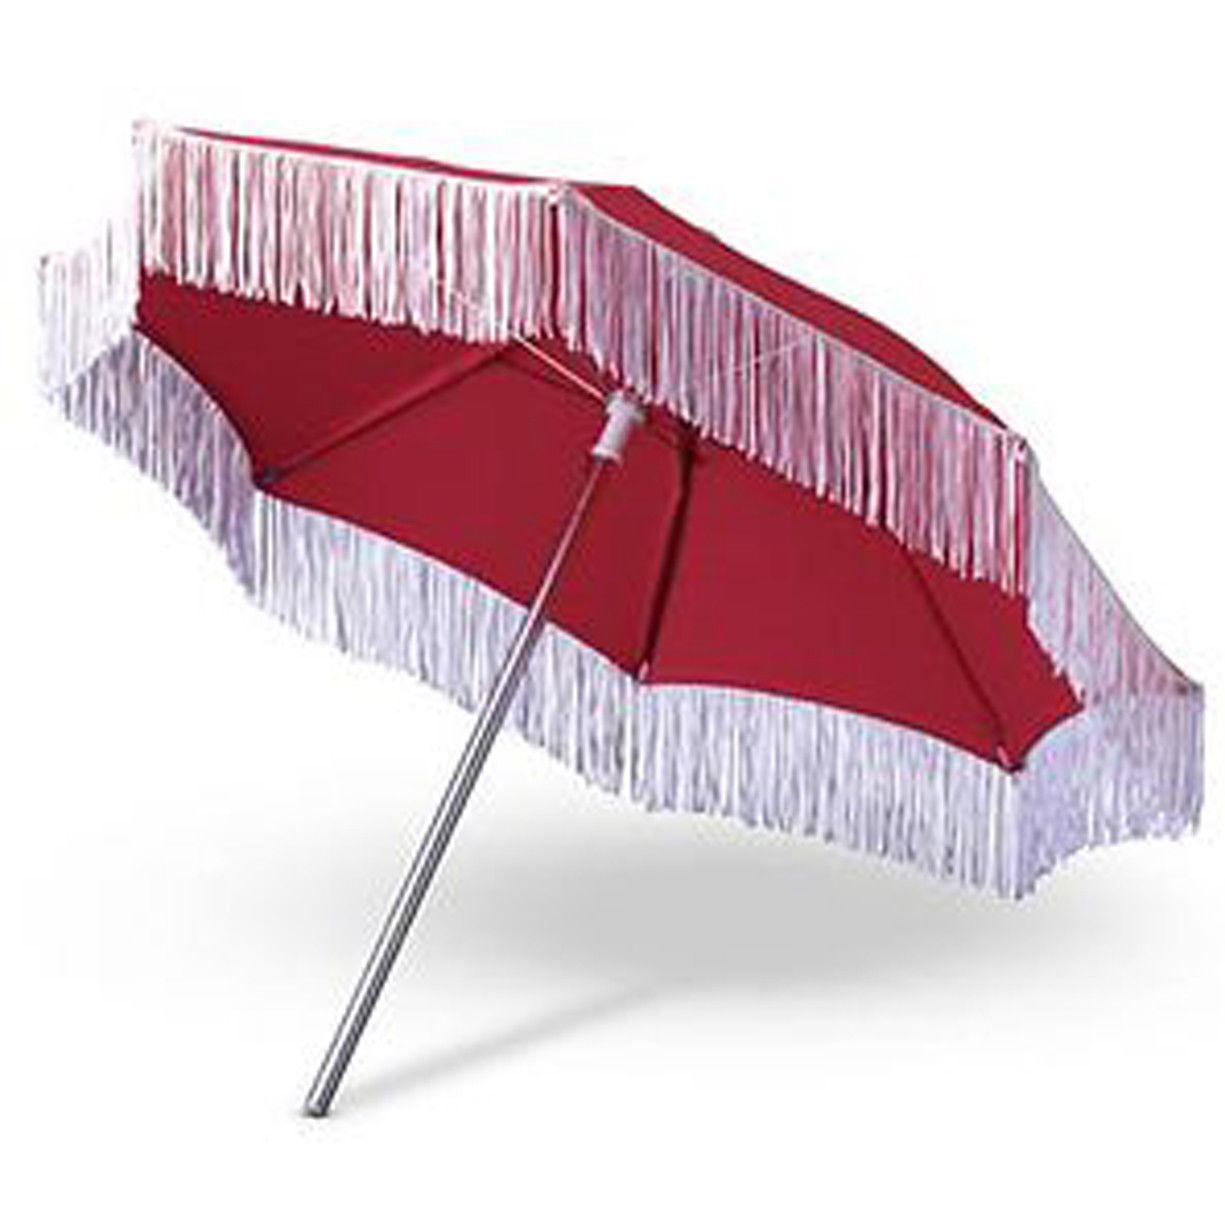 American Girl Samantha's Beach Umbrella, MIB